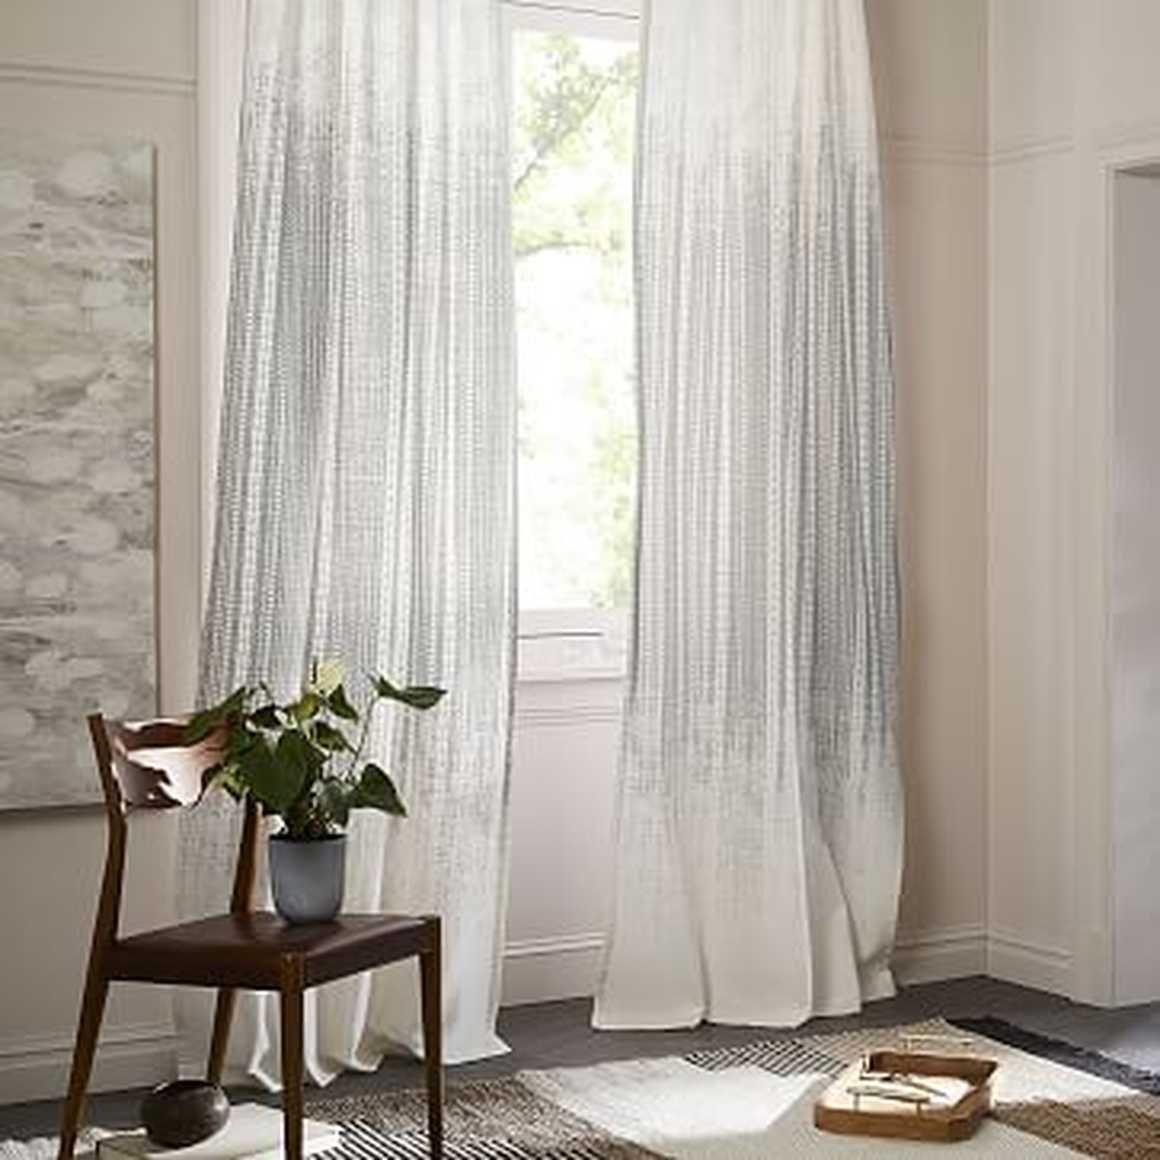 Echo Print Curtain Set Of 2 Platinum 48 X96 West Elm Printed Curtains Curtains Living Room Curtains Living #printed #curtains #for #living #room